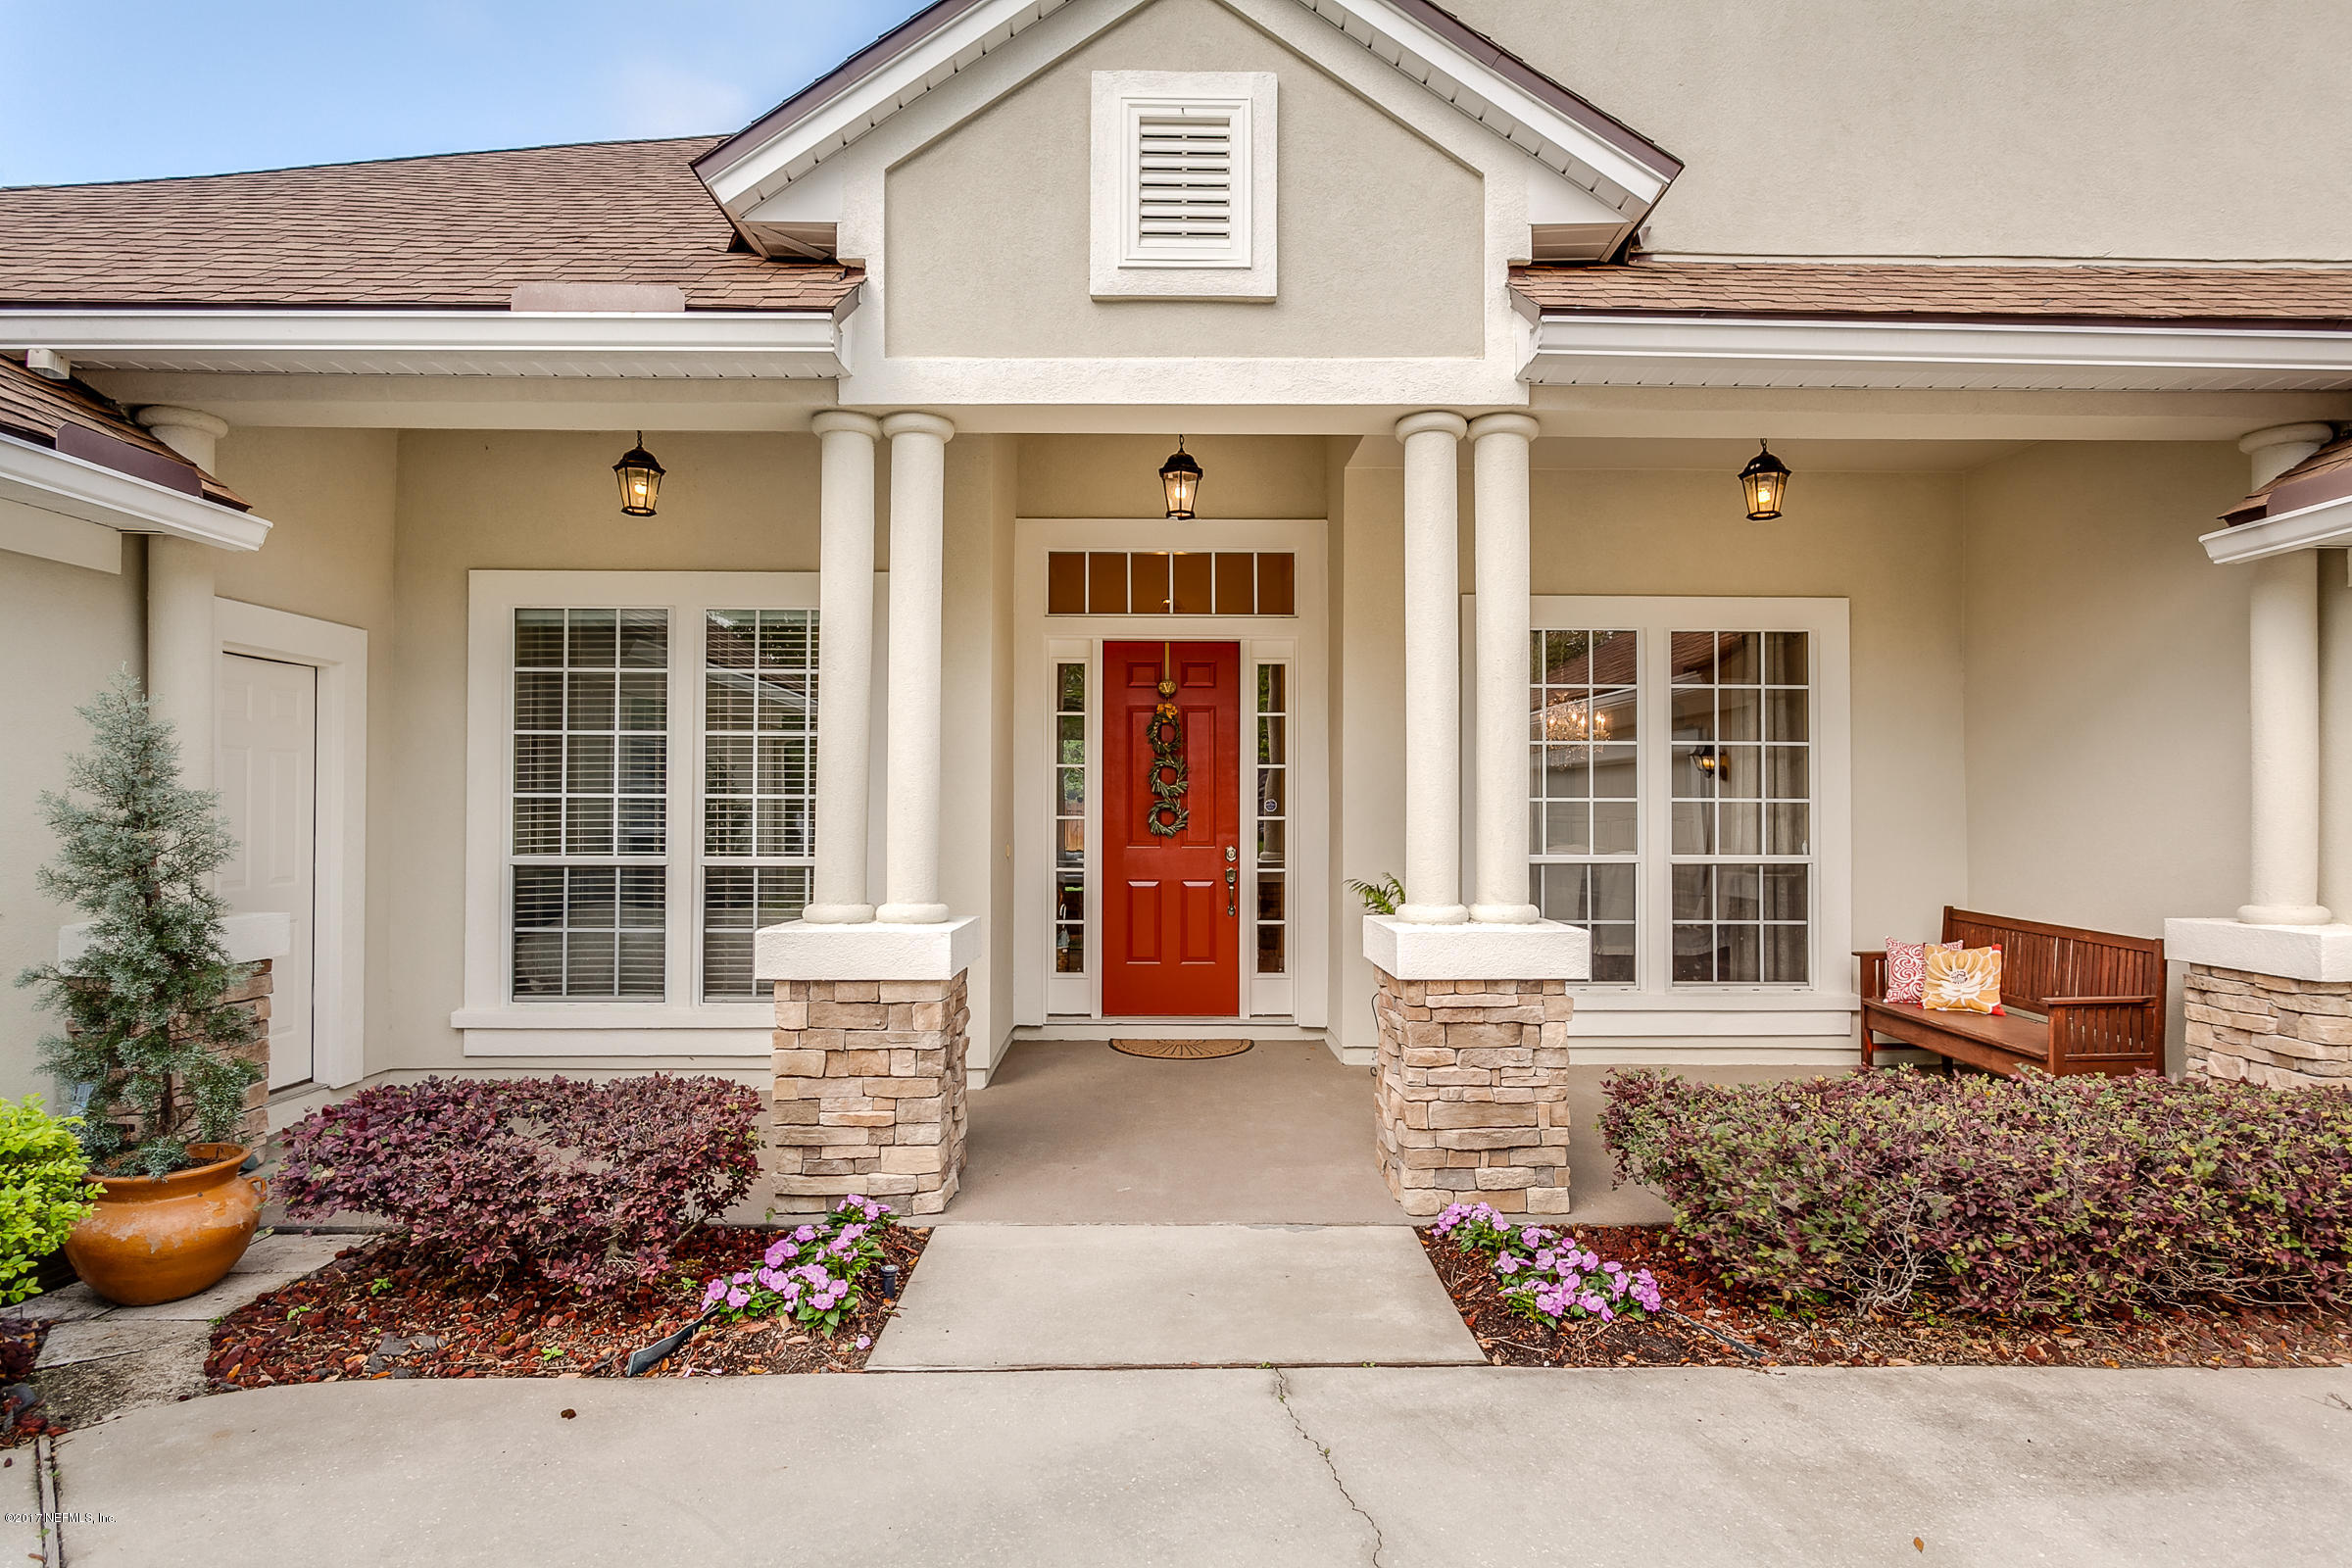 2480 CROSSWICKS, ORANGE PARK, FLORIDA 32003, 5 Bedrooms Bedrooms, ,4 BathroomsBathrooms,Residential - single family,For sale,CROSSWICKS,943999